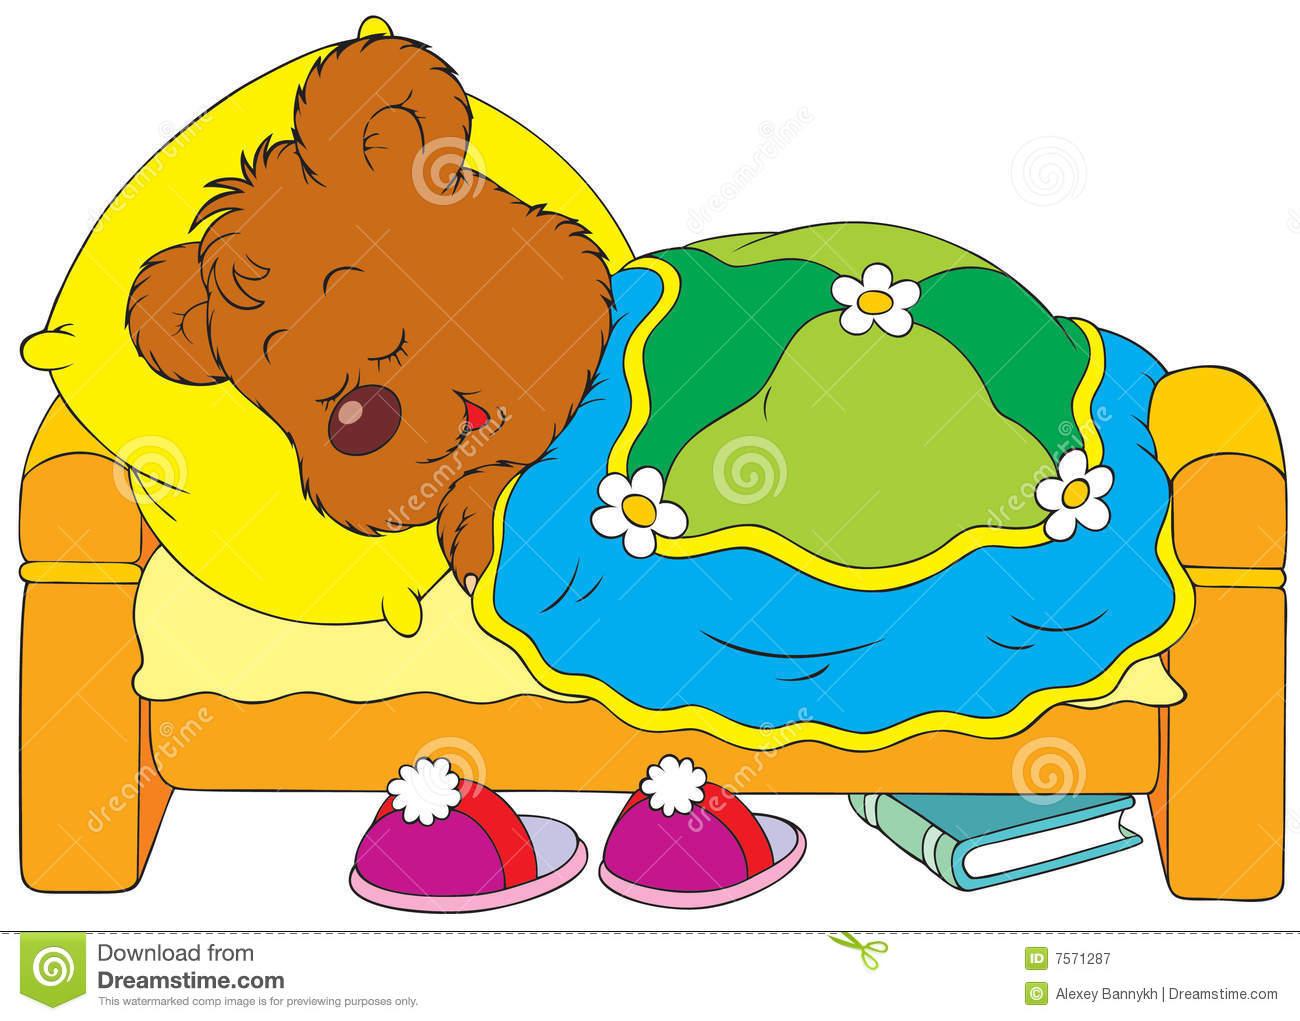 Child sleeping panda free. Bed clipart children's